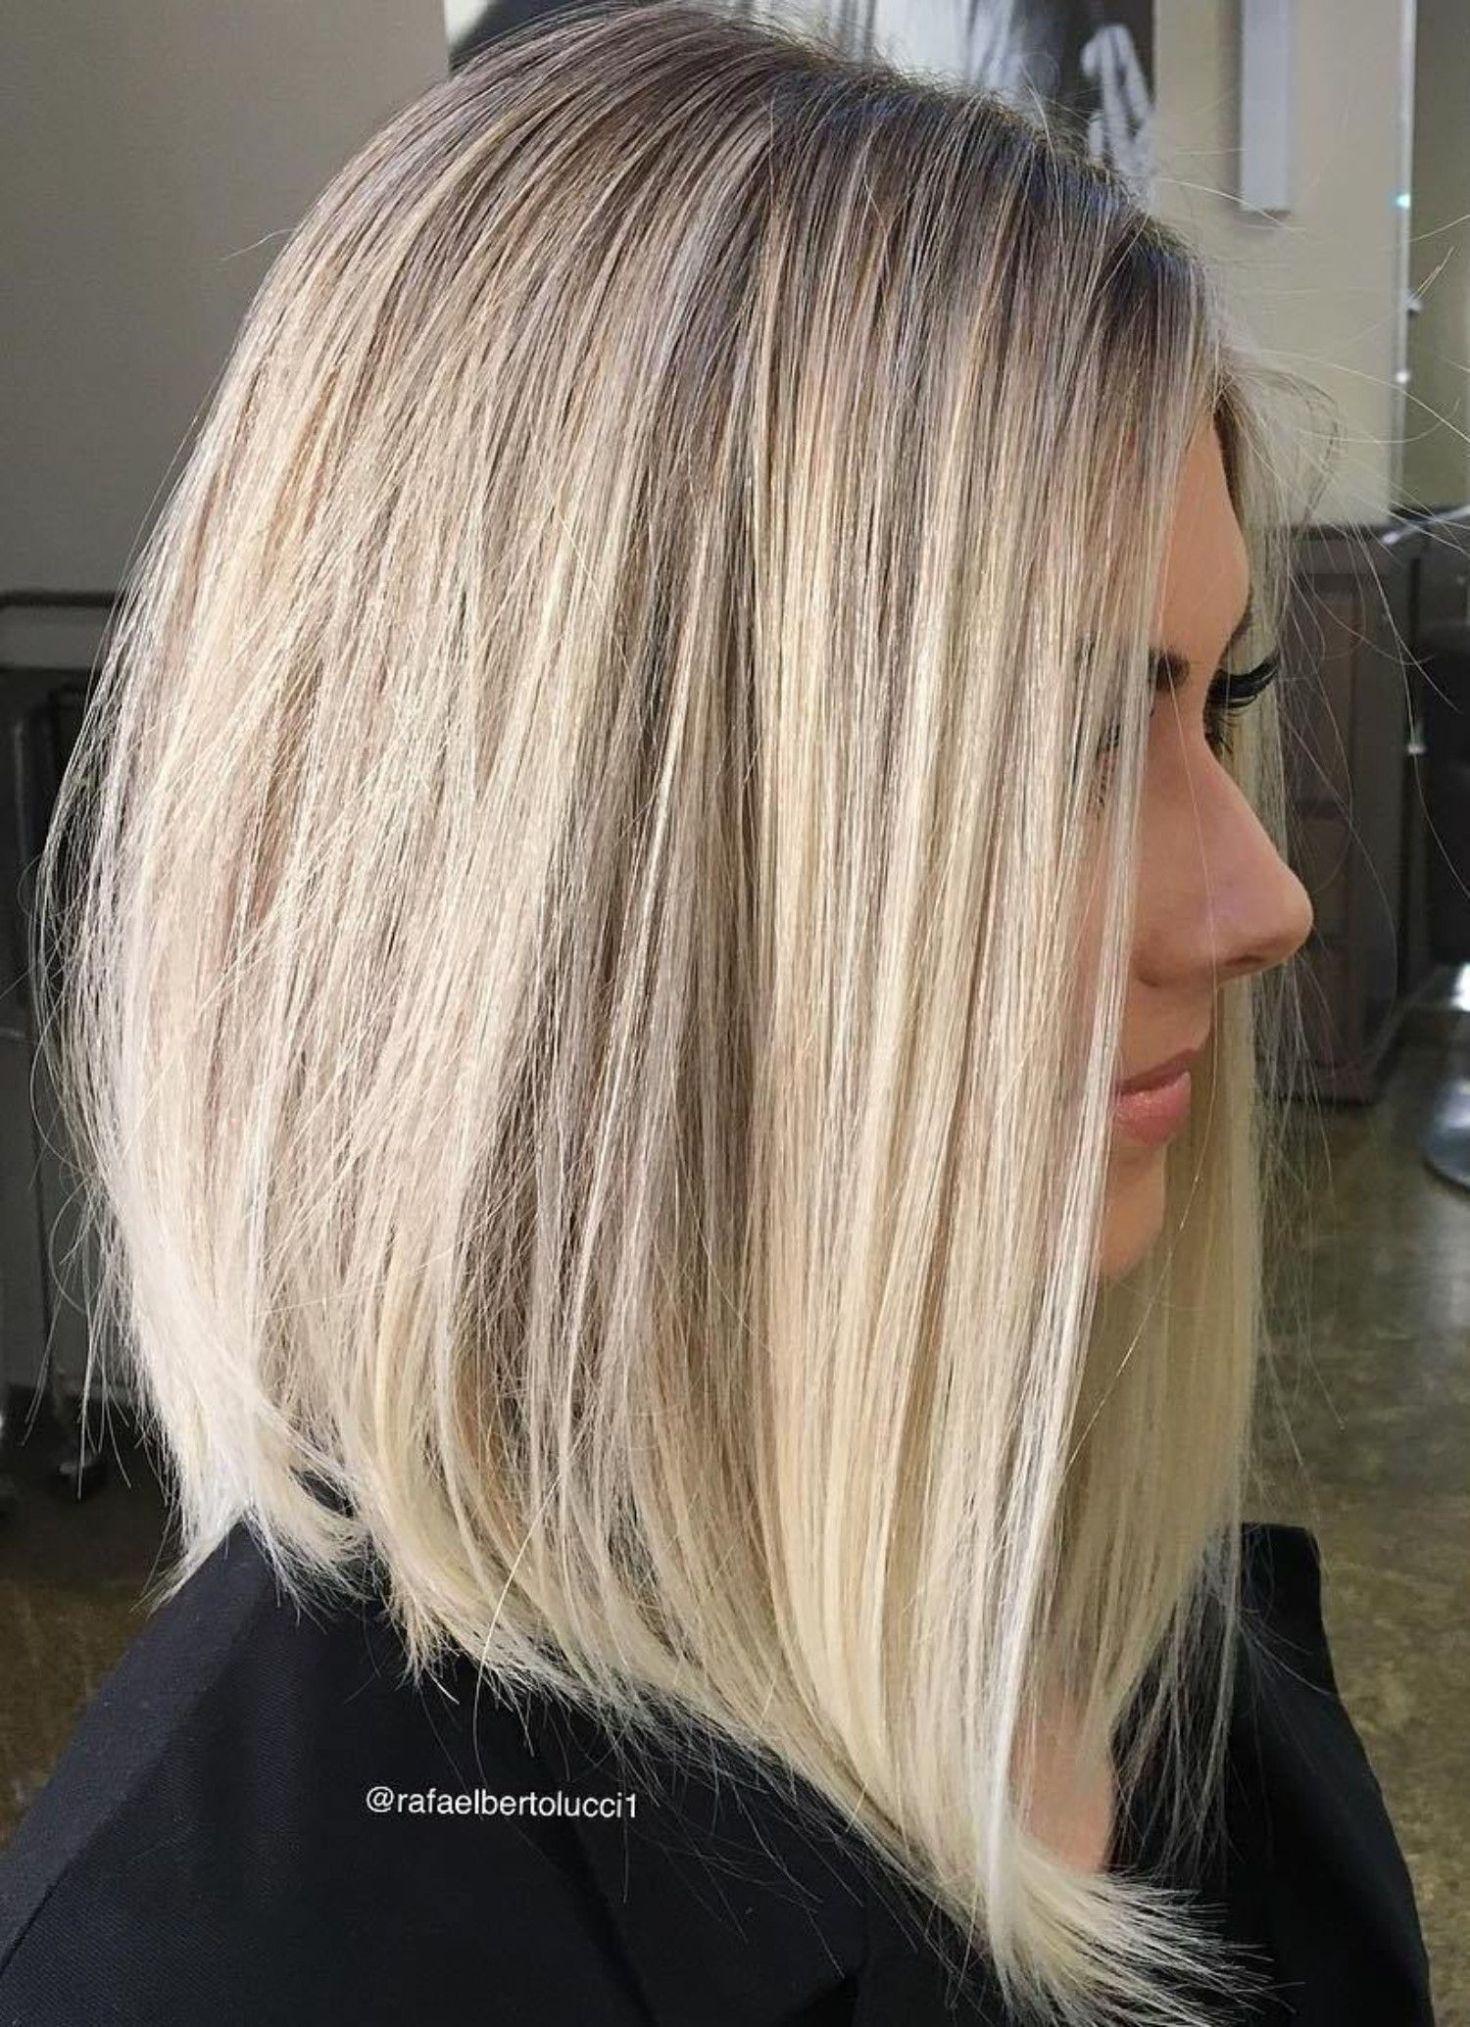 Coole Duennes Frisurenmittellangeshaareinfach Fur Haar Haarschnitte Verheerend Platin In 2020 Haarschnitt Haarschnitt Fur Dunnes Haar Schulterlange Haarschnitte